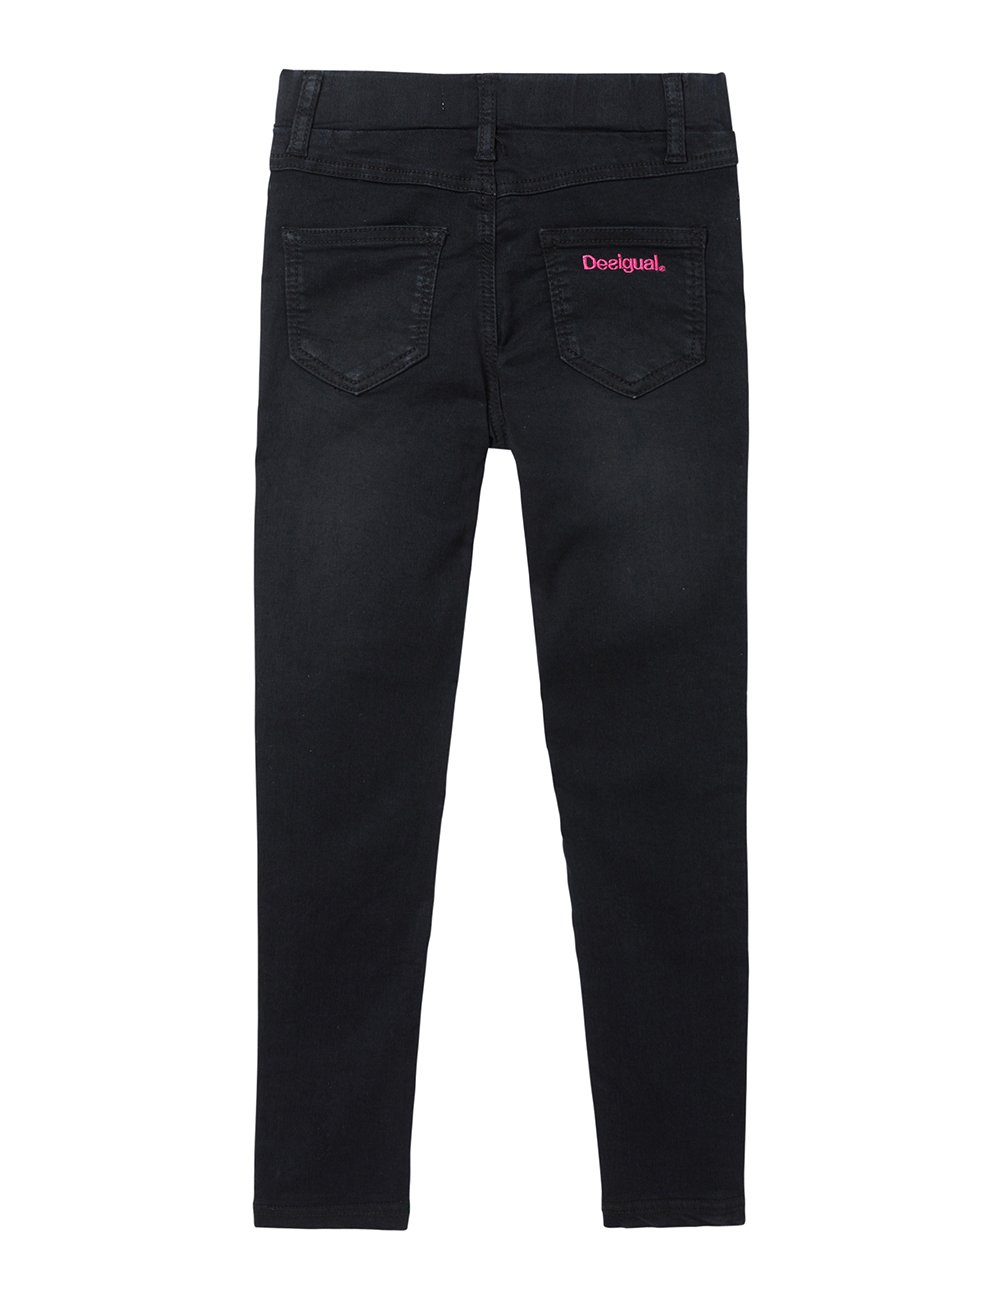 Desigual Denim_pubill Pantalones para Niñas